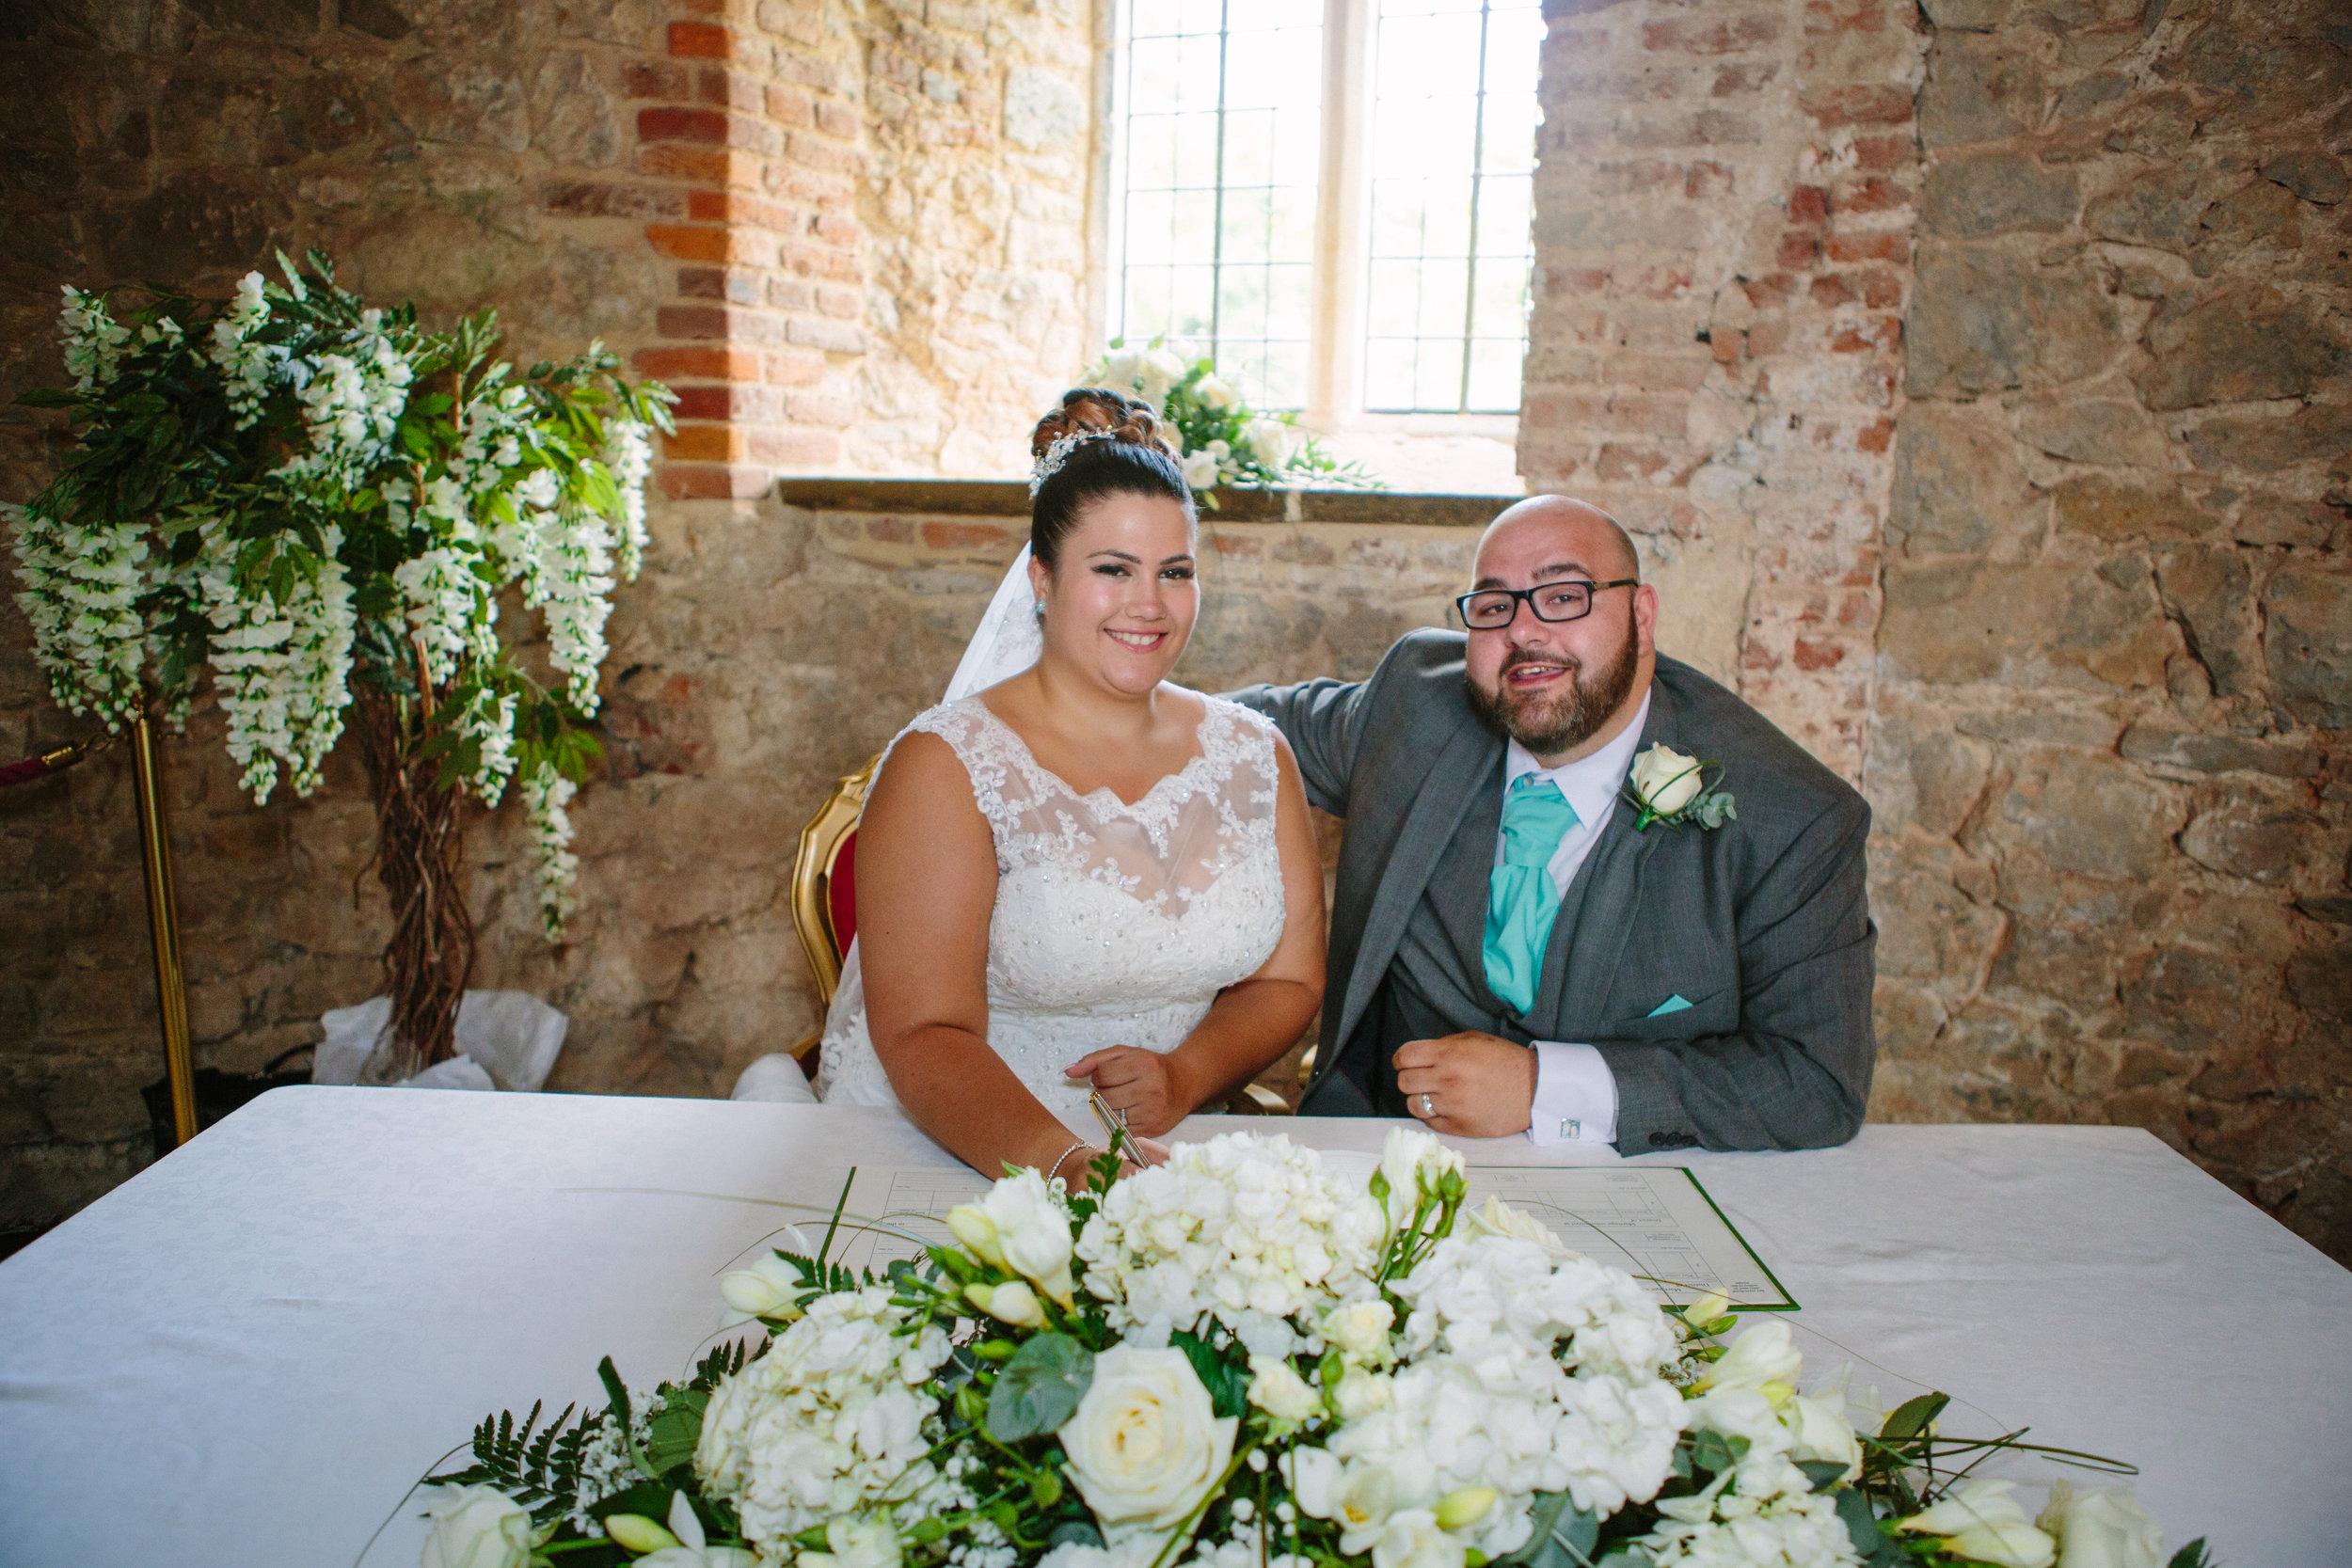 westenhangar-castle-kent-london-wedding-photography-signing-register-42